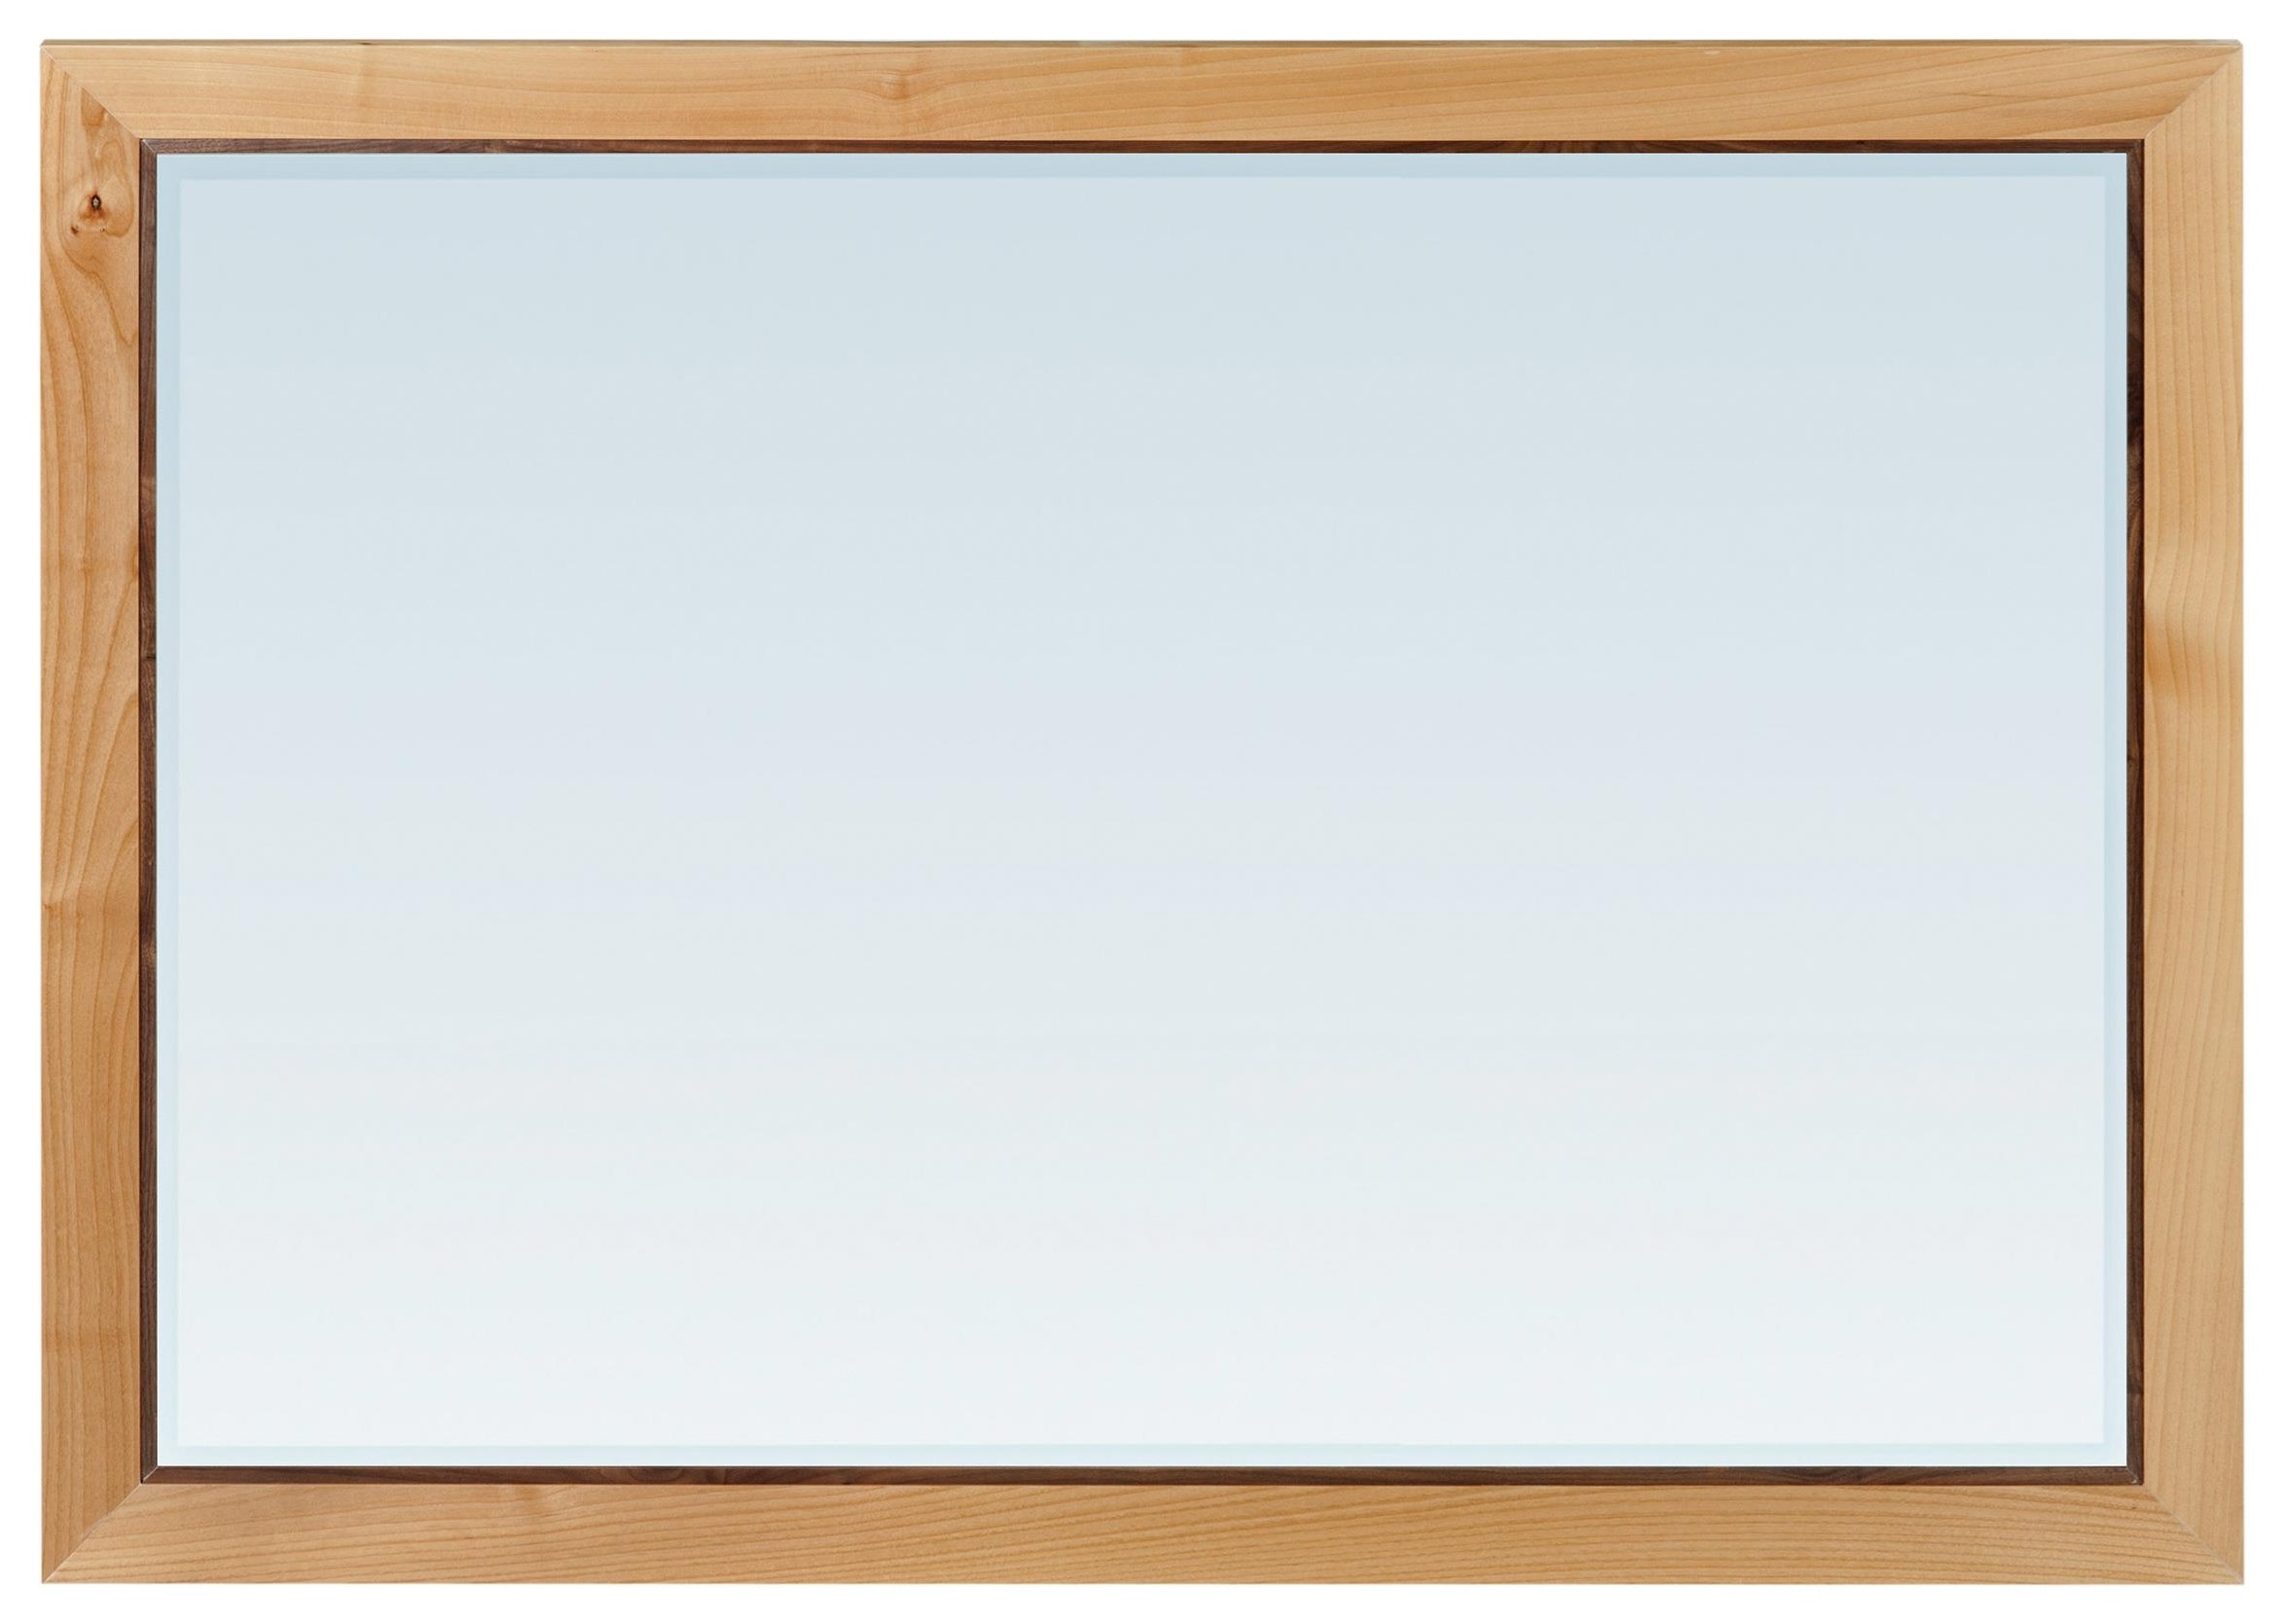 Addison Mirror by Whittier Wood at Crowley Furniture & Mattress